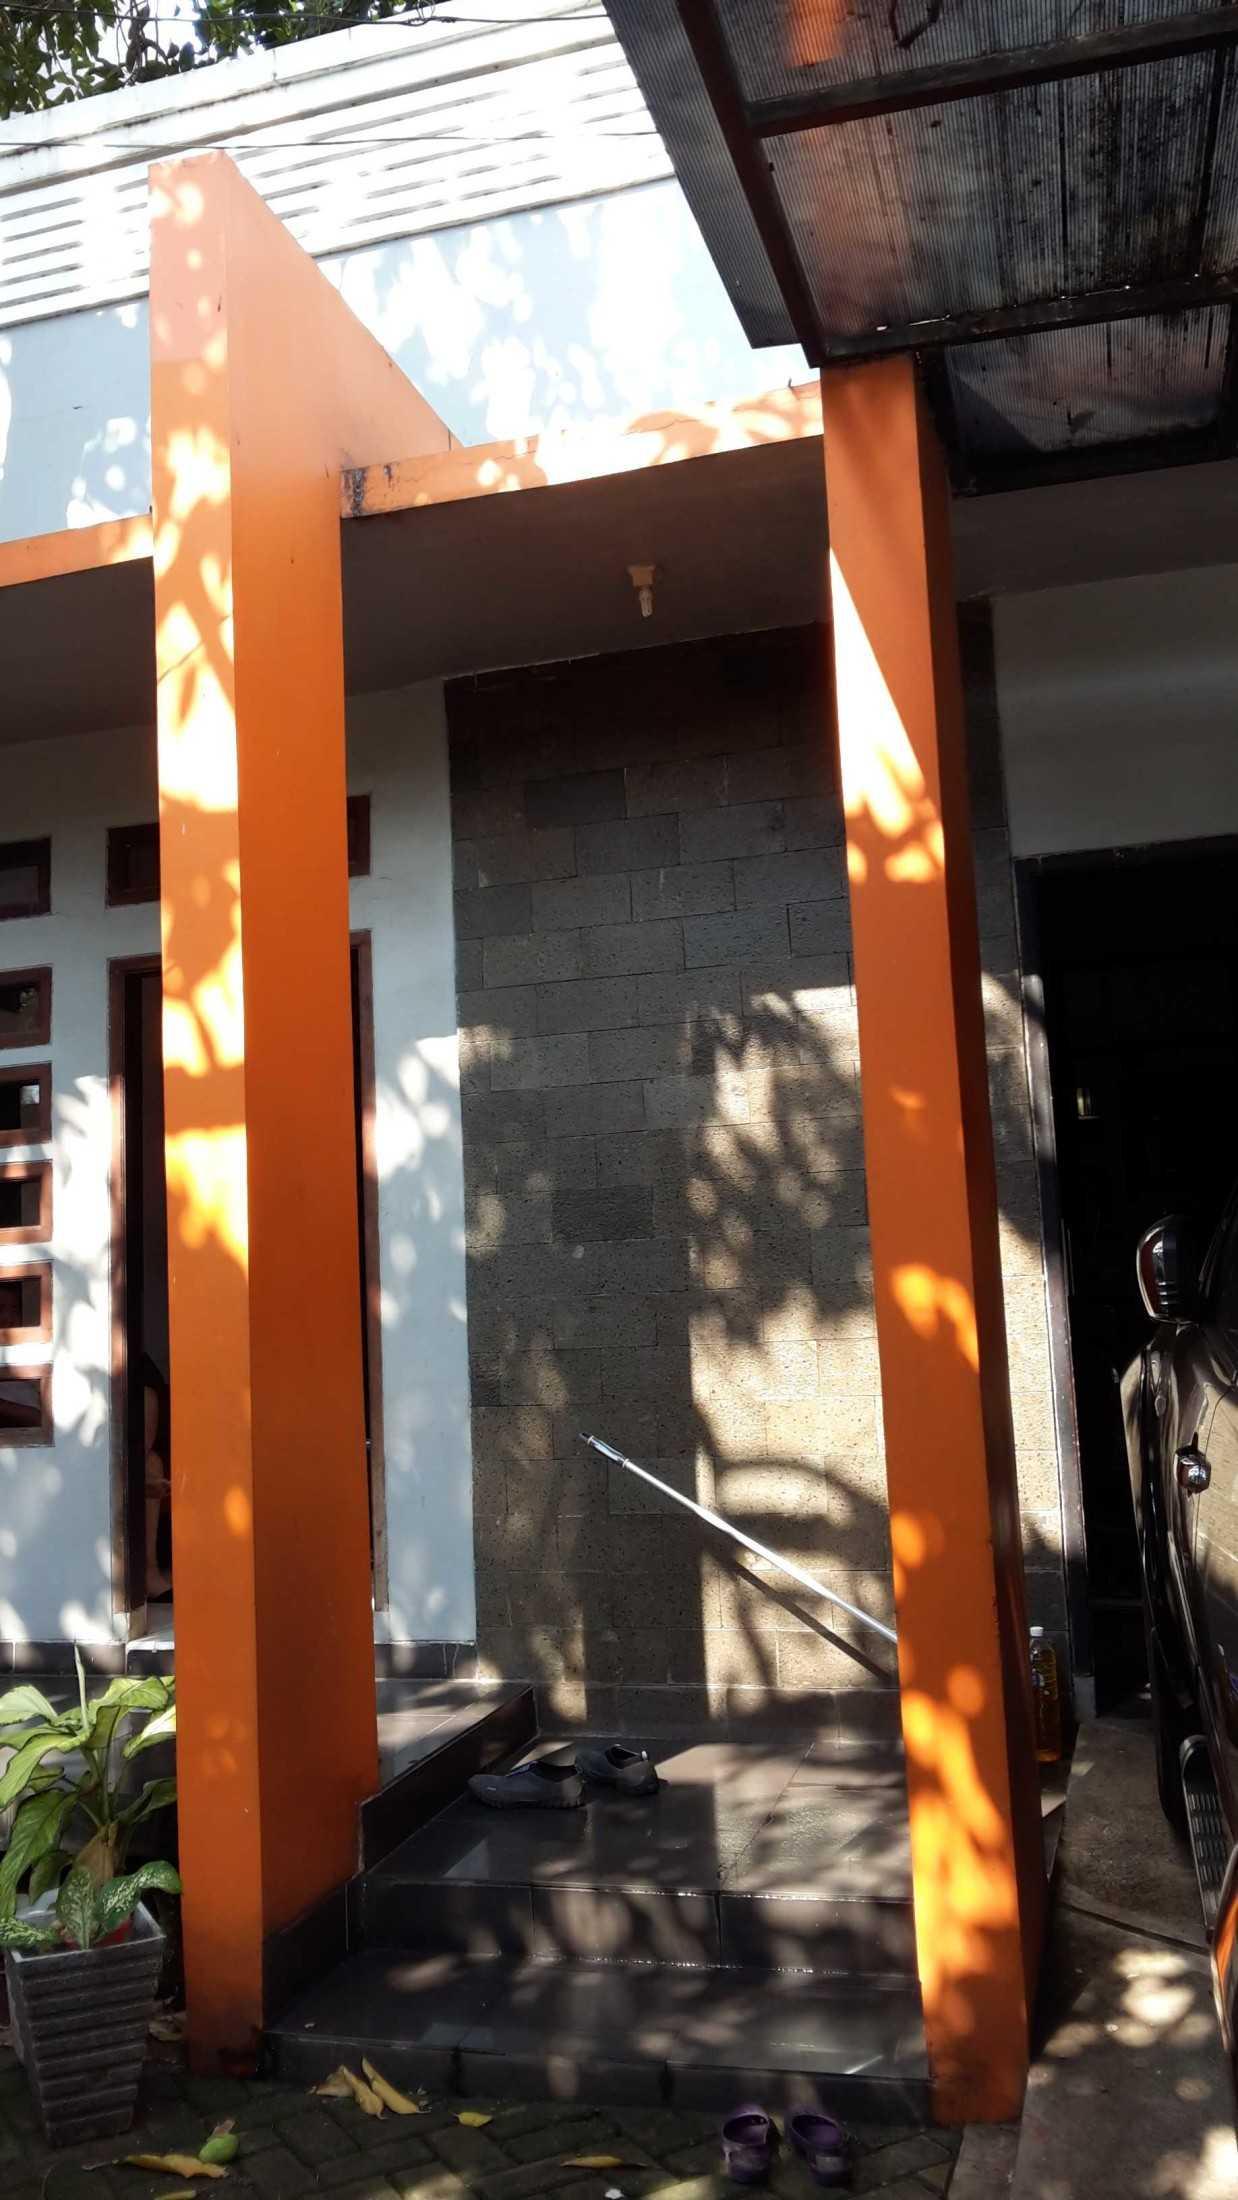 Ideall Design Renovasi Rumah Roof Top Box Rawabadak Utara, Kec. Koja, Kota Jkt Utara, Daerah Khusus Ibukota Jakarta, Indonesia Rawabadak Utara, Kec. Koja, Kota Jkt Utara, Daerah Khusus Ibukota Jakarta, Indonesia Ideall-Design-When-A-Design-Idea-Becomes-Ideal-Design-For-All-Rumah-Box-Rawabadak  113744